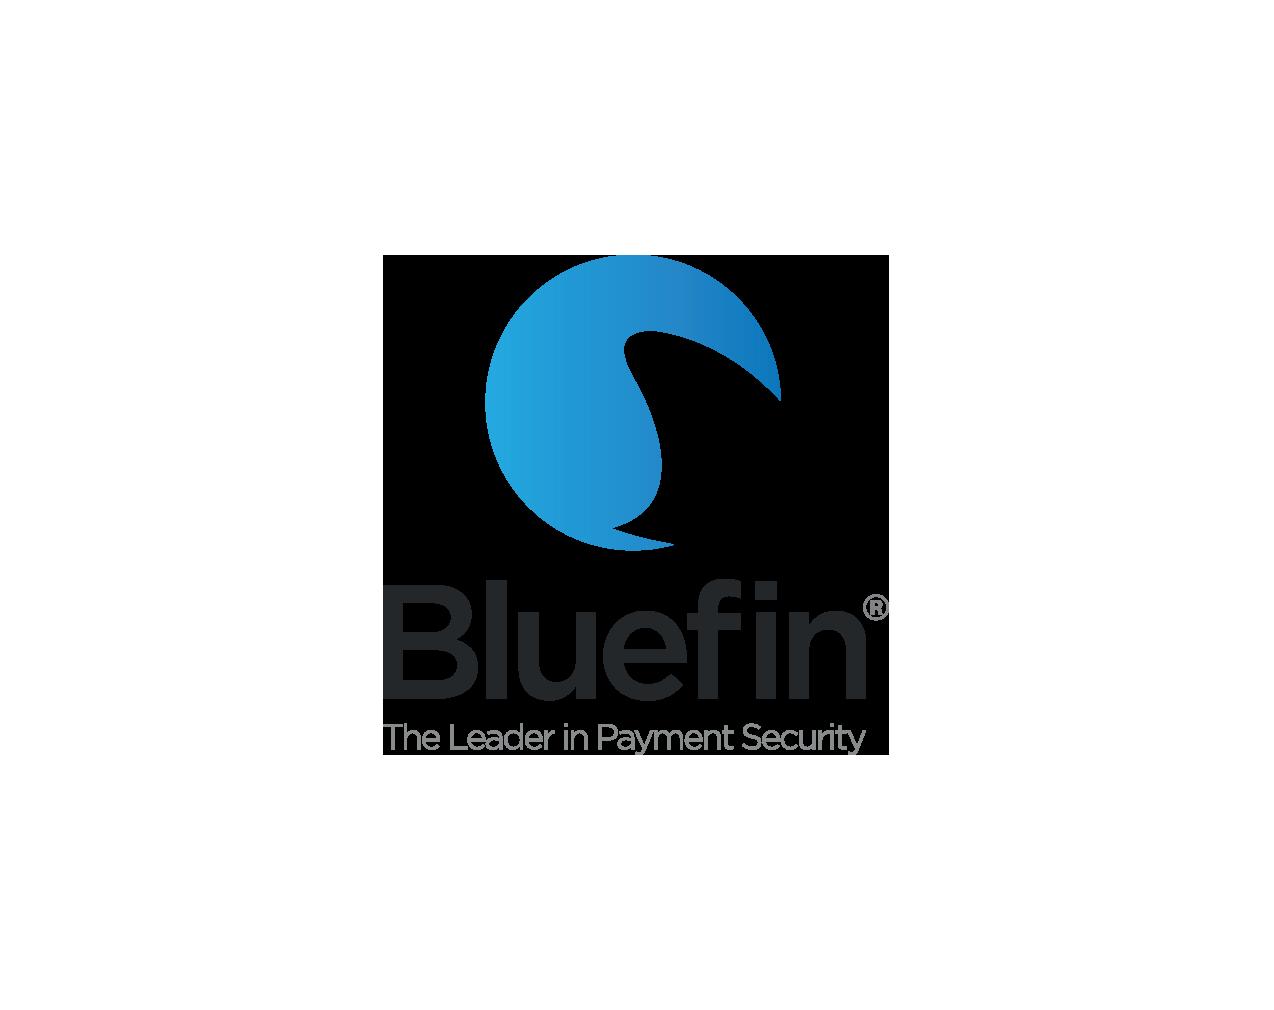 Bluefin_logo.png